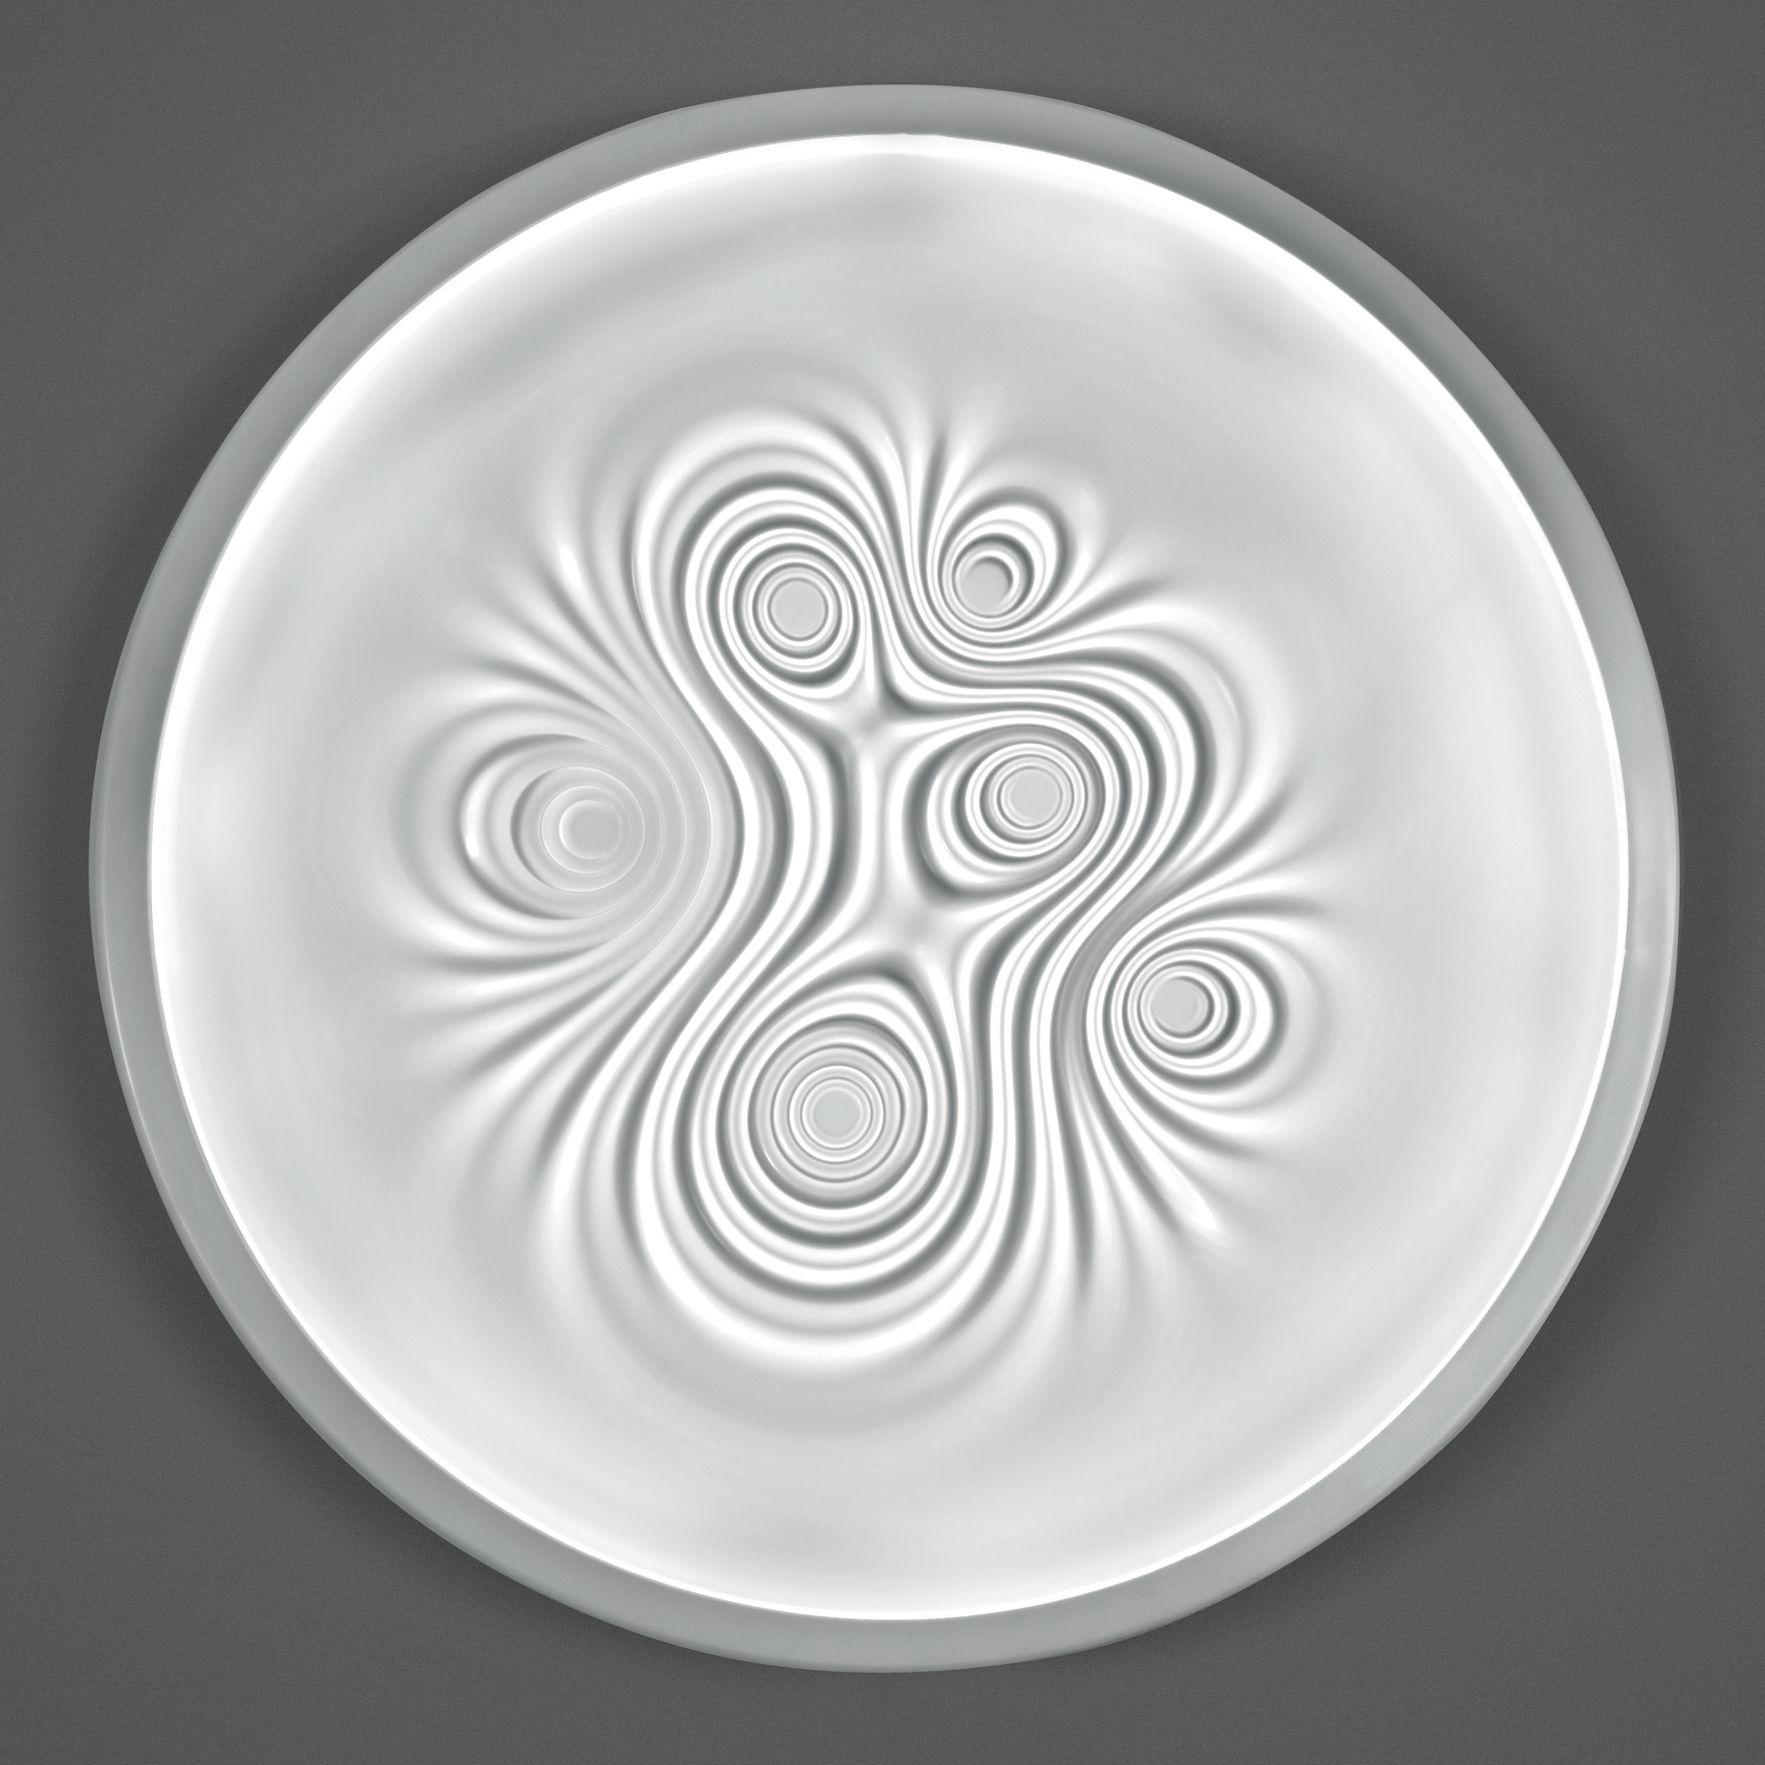 Illuminazione - Lampade da parete - Applique Nebula - LED / Plafoniera - Ø 80 cm di Artemide - Bianco - Alluminio, Méthacrylate opalin